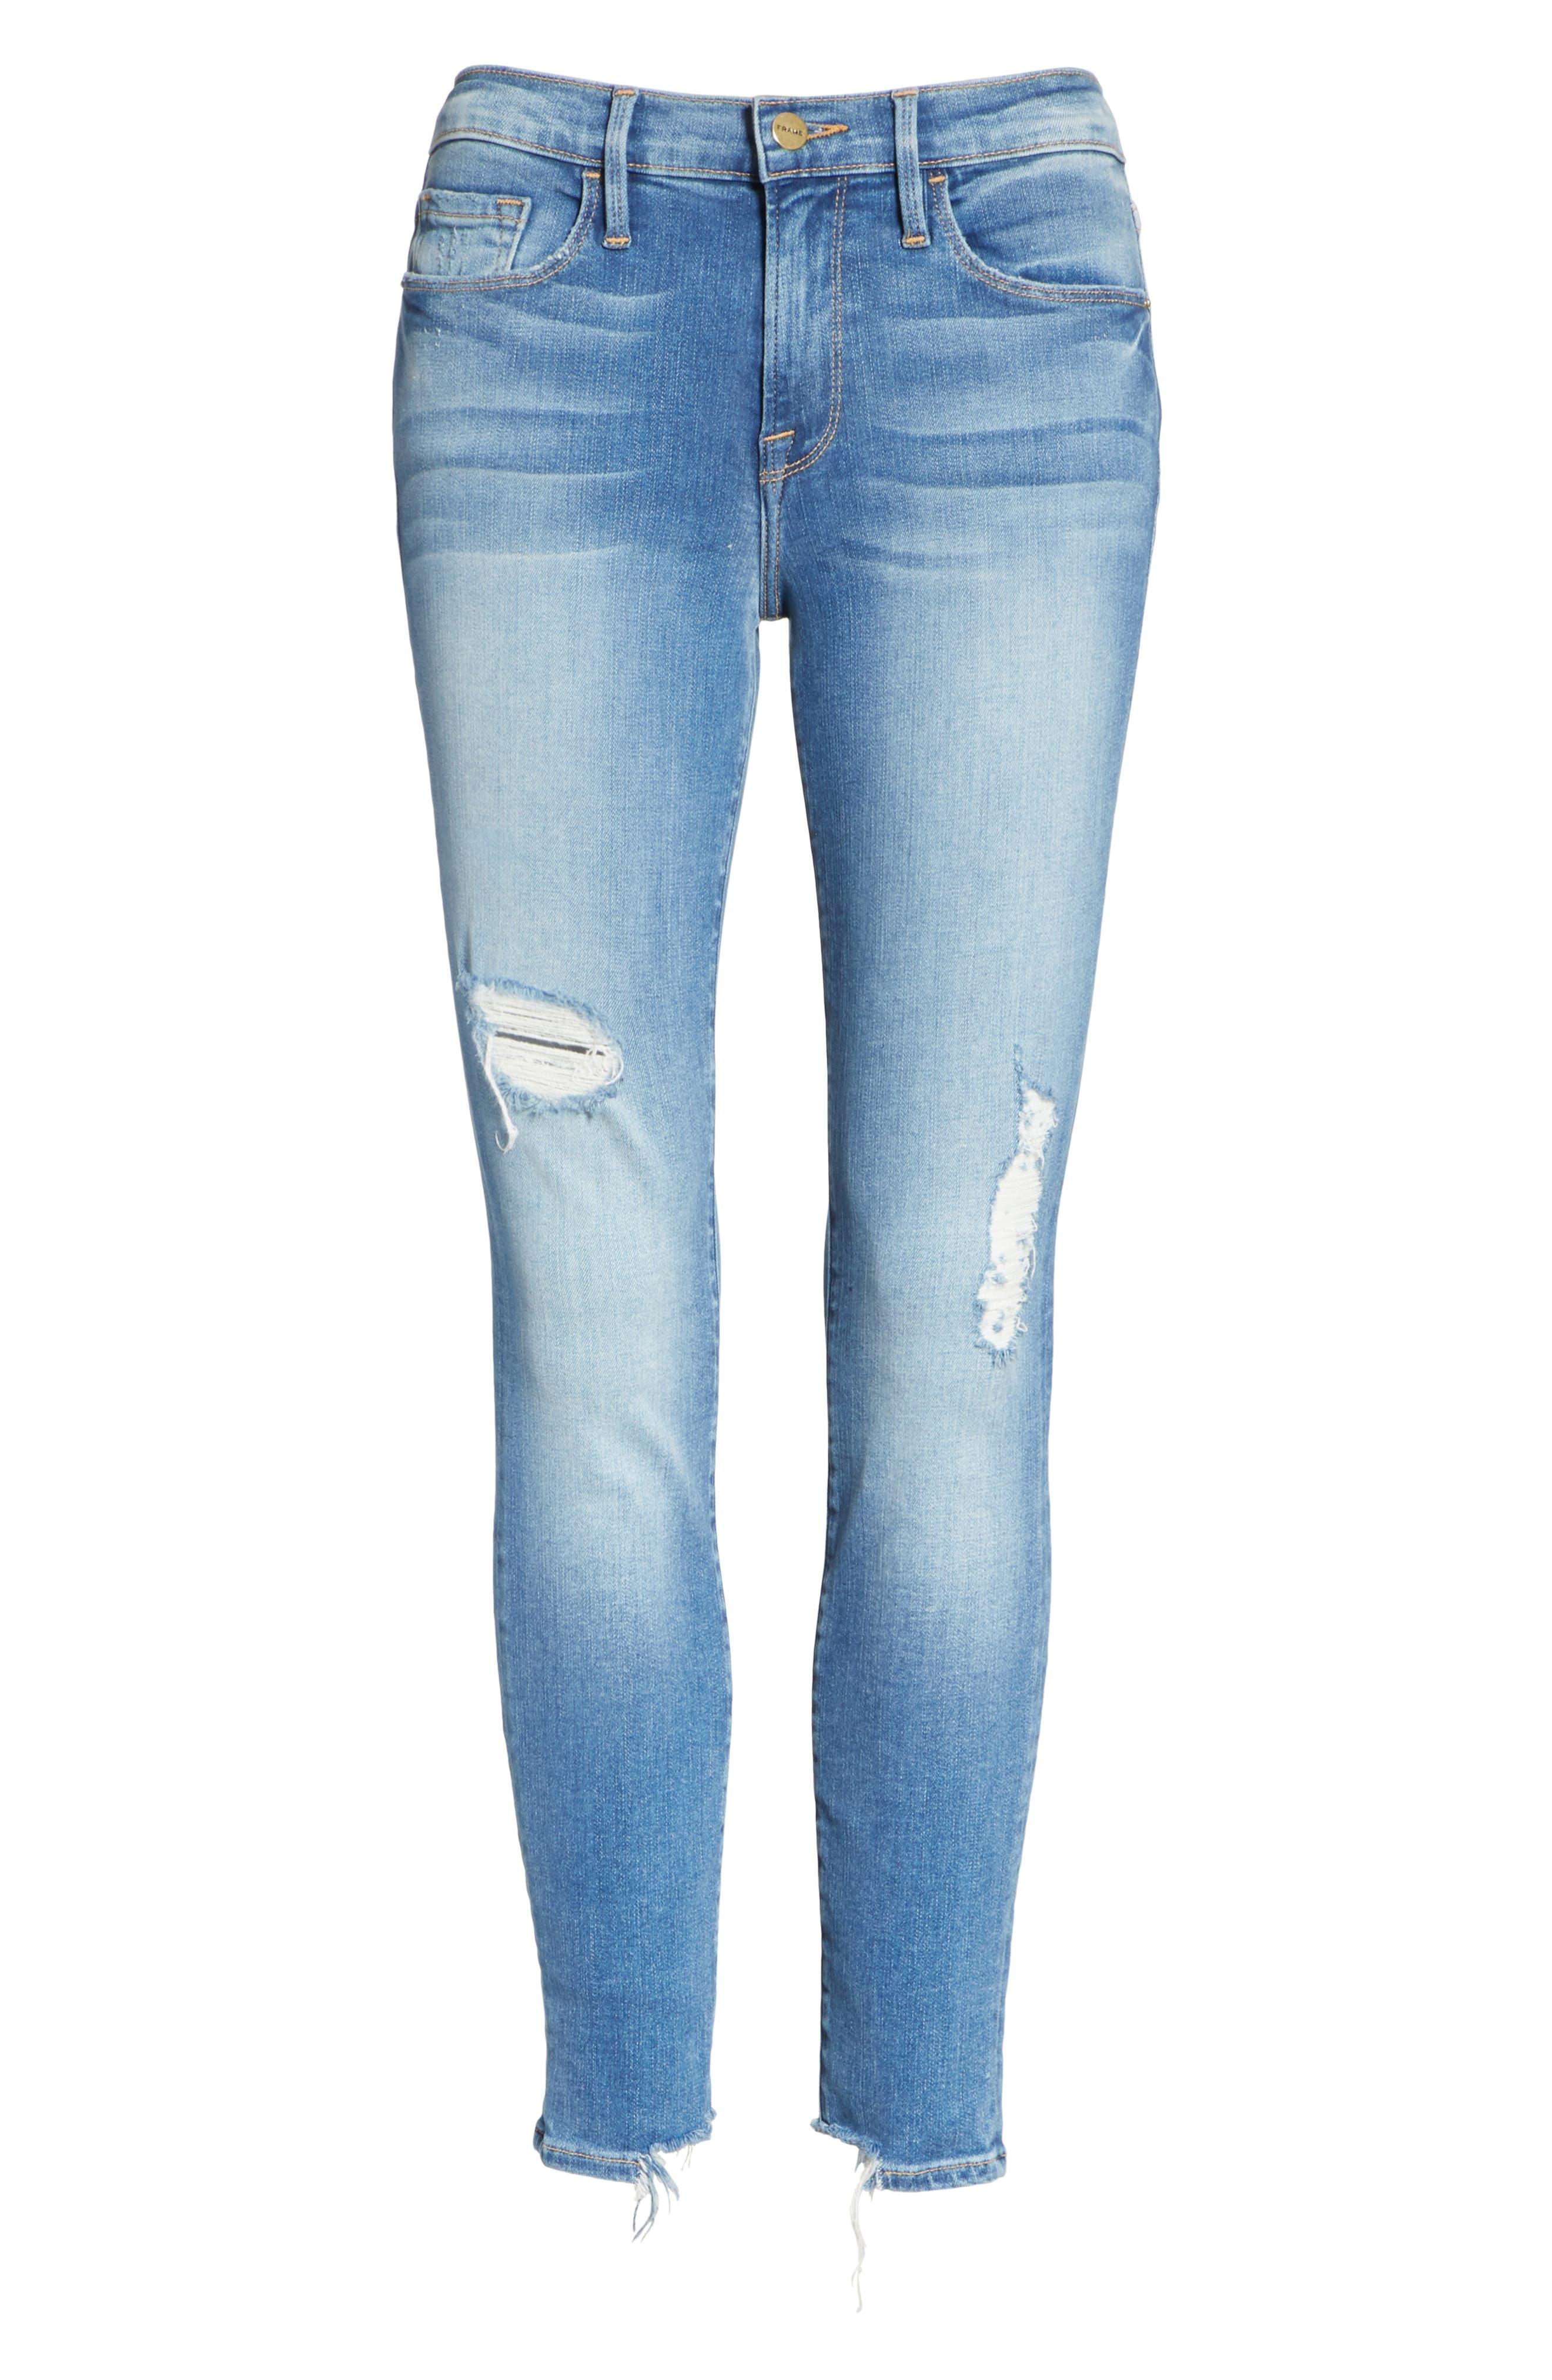 Le Skinny de Jeanne Crop Jeans,                             Alternate thumbnail 6, color,                             Timberland Exclusive